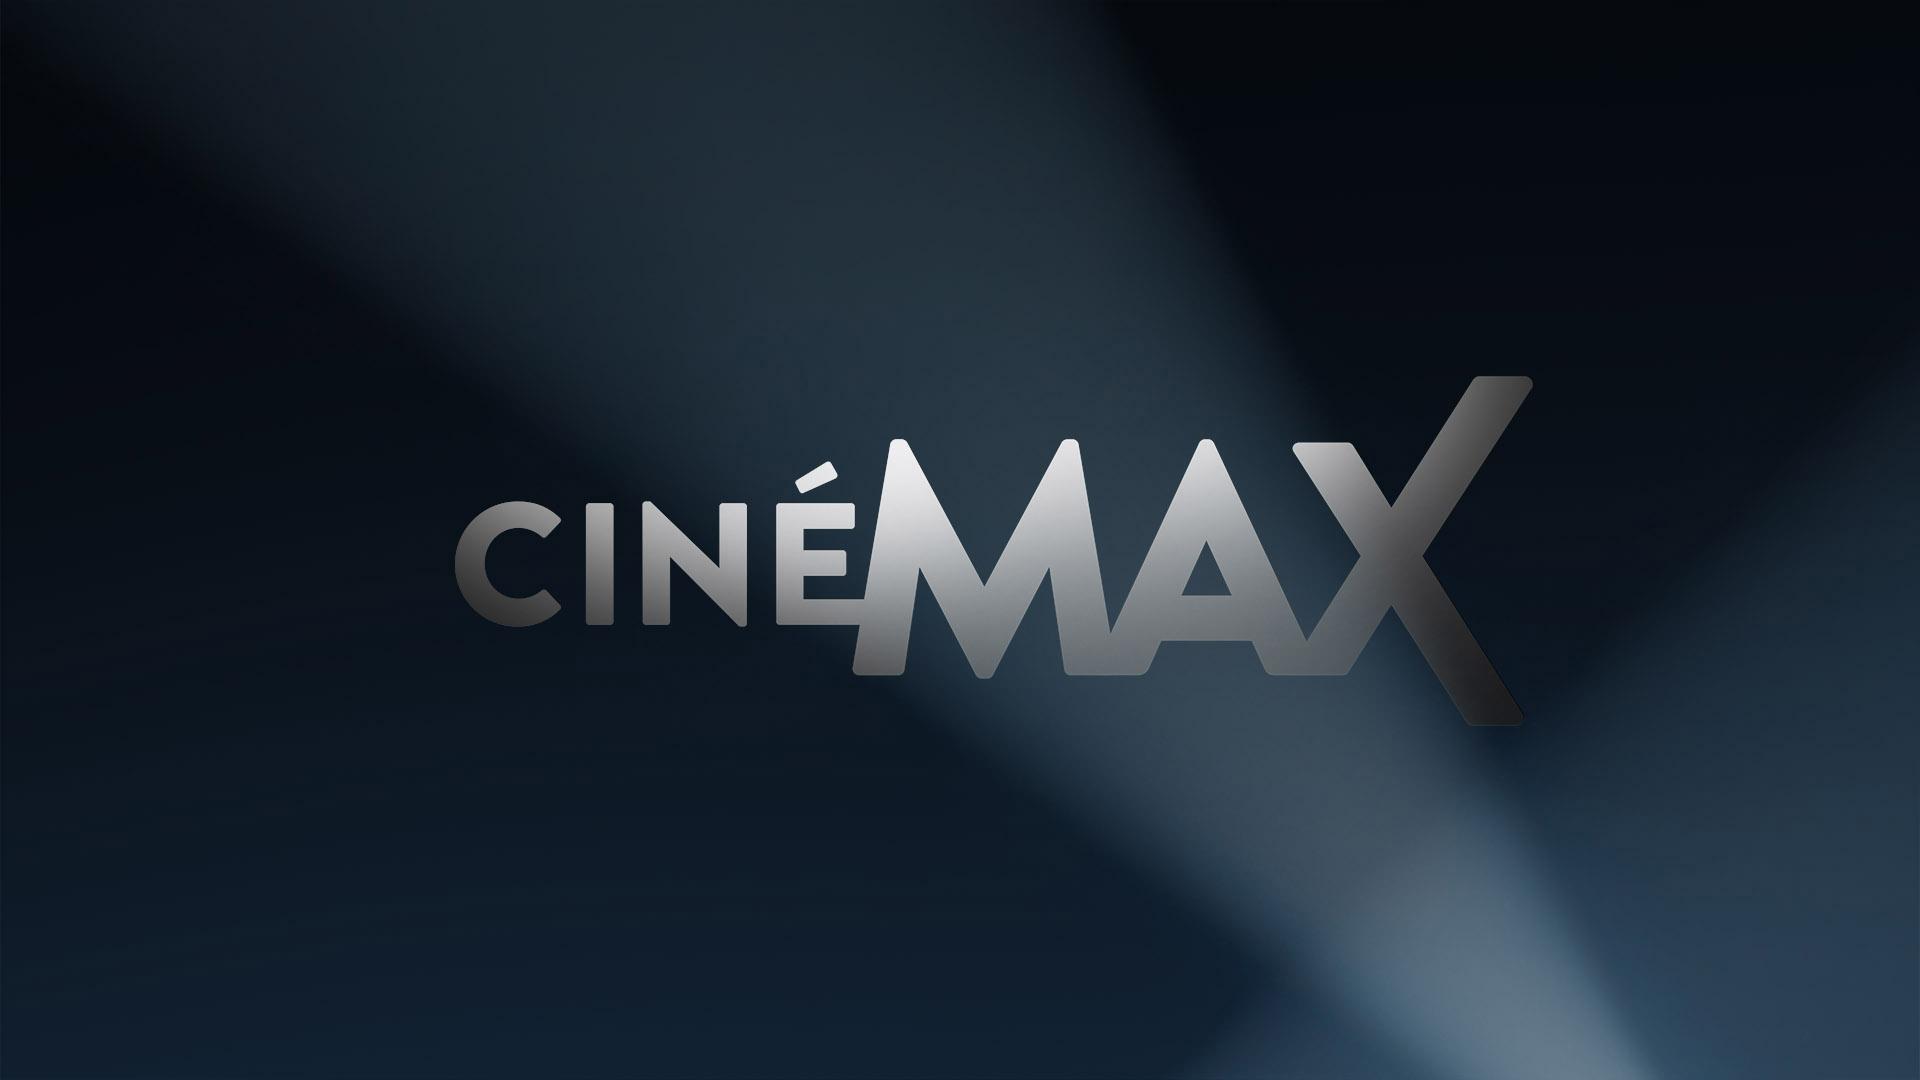 idcinemamax04